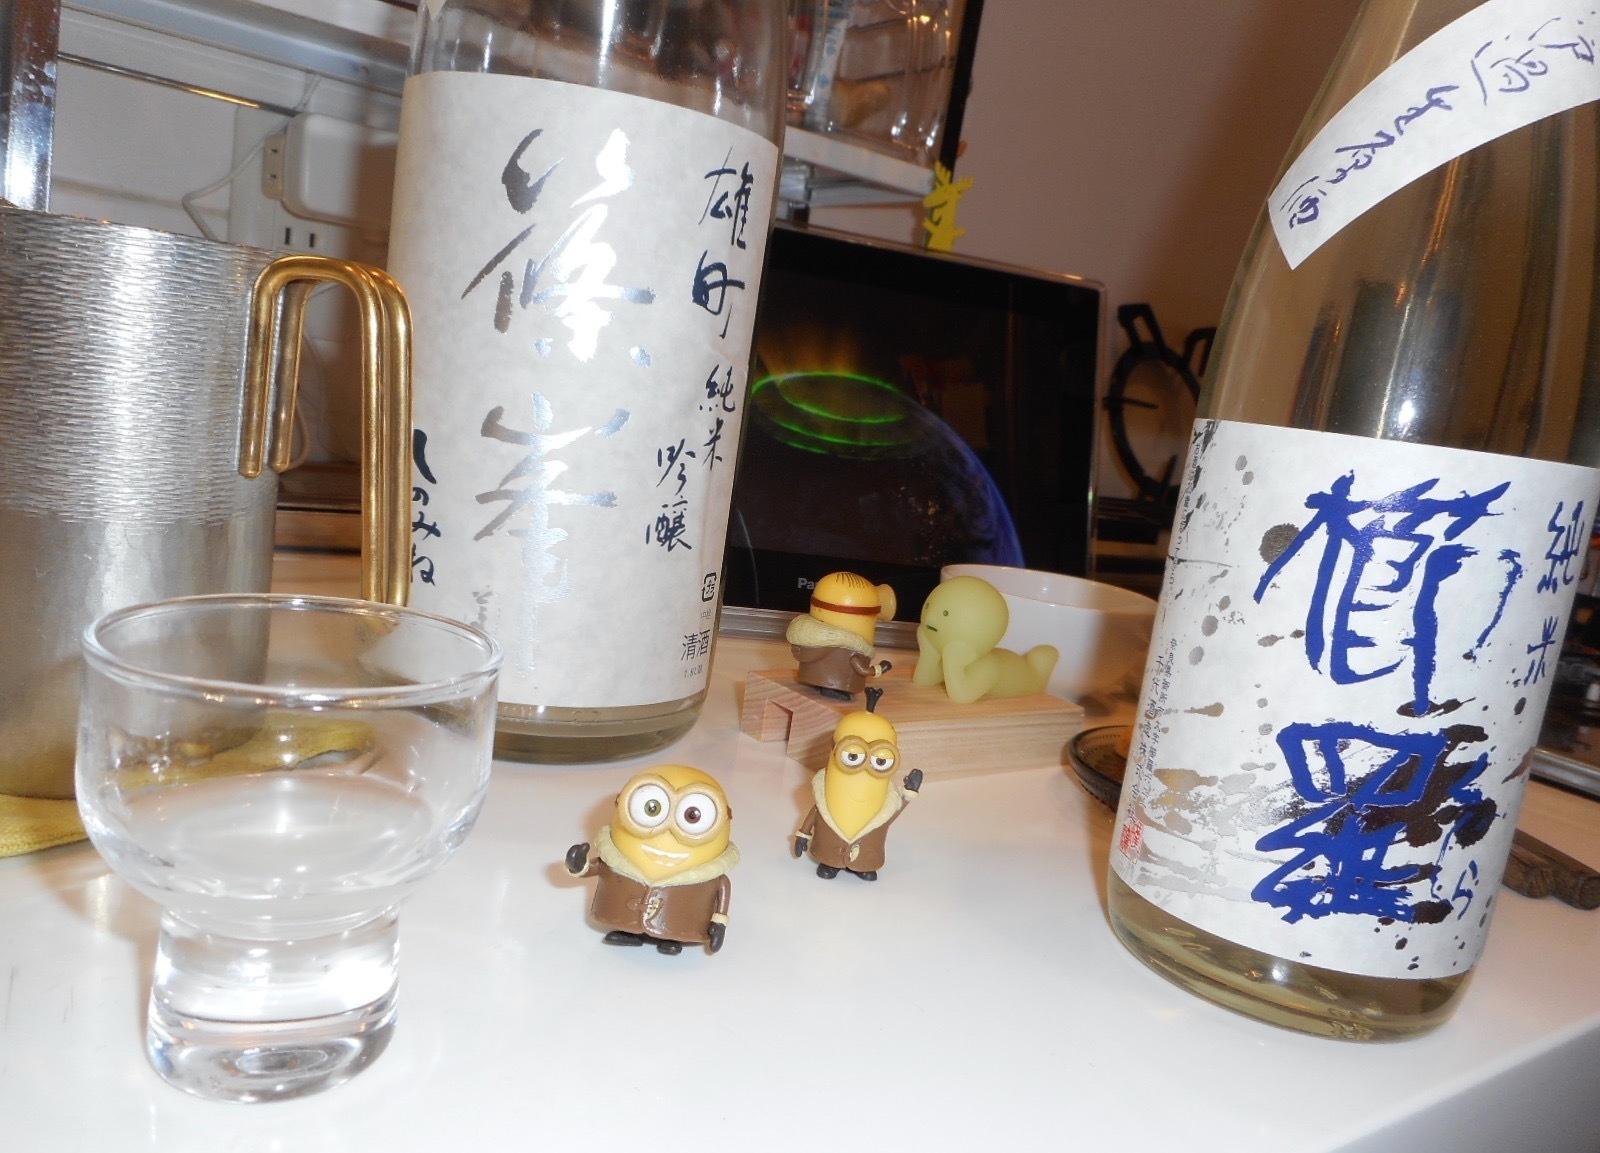 kujira_junmai_kodama27by4.jpg